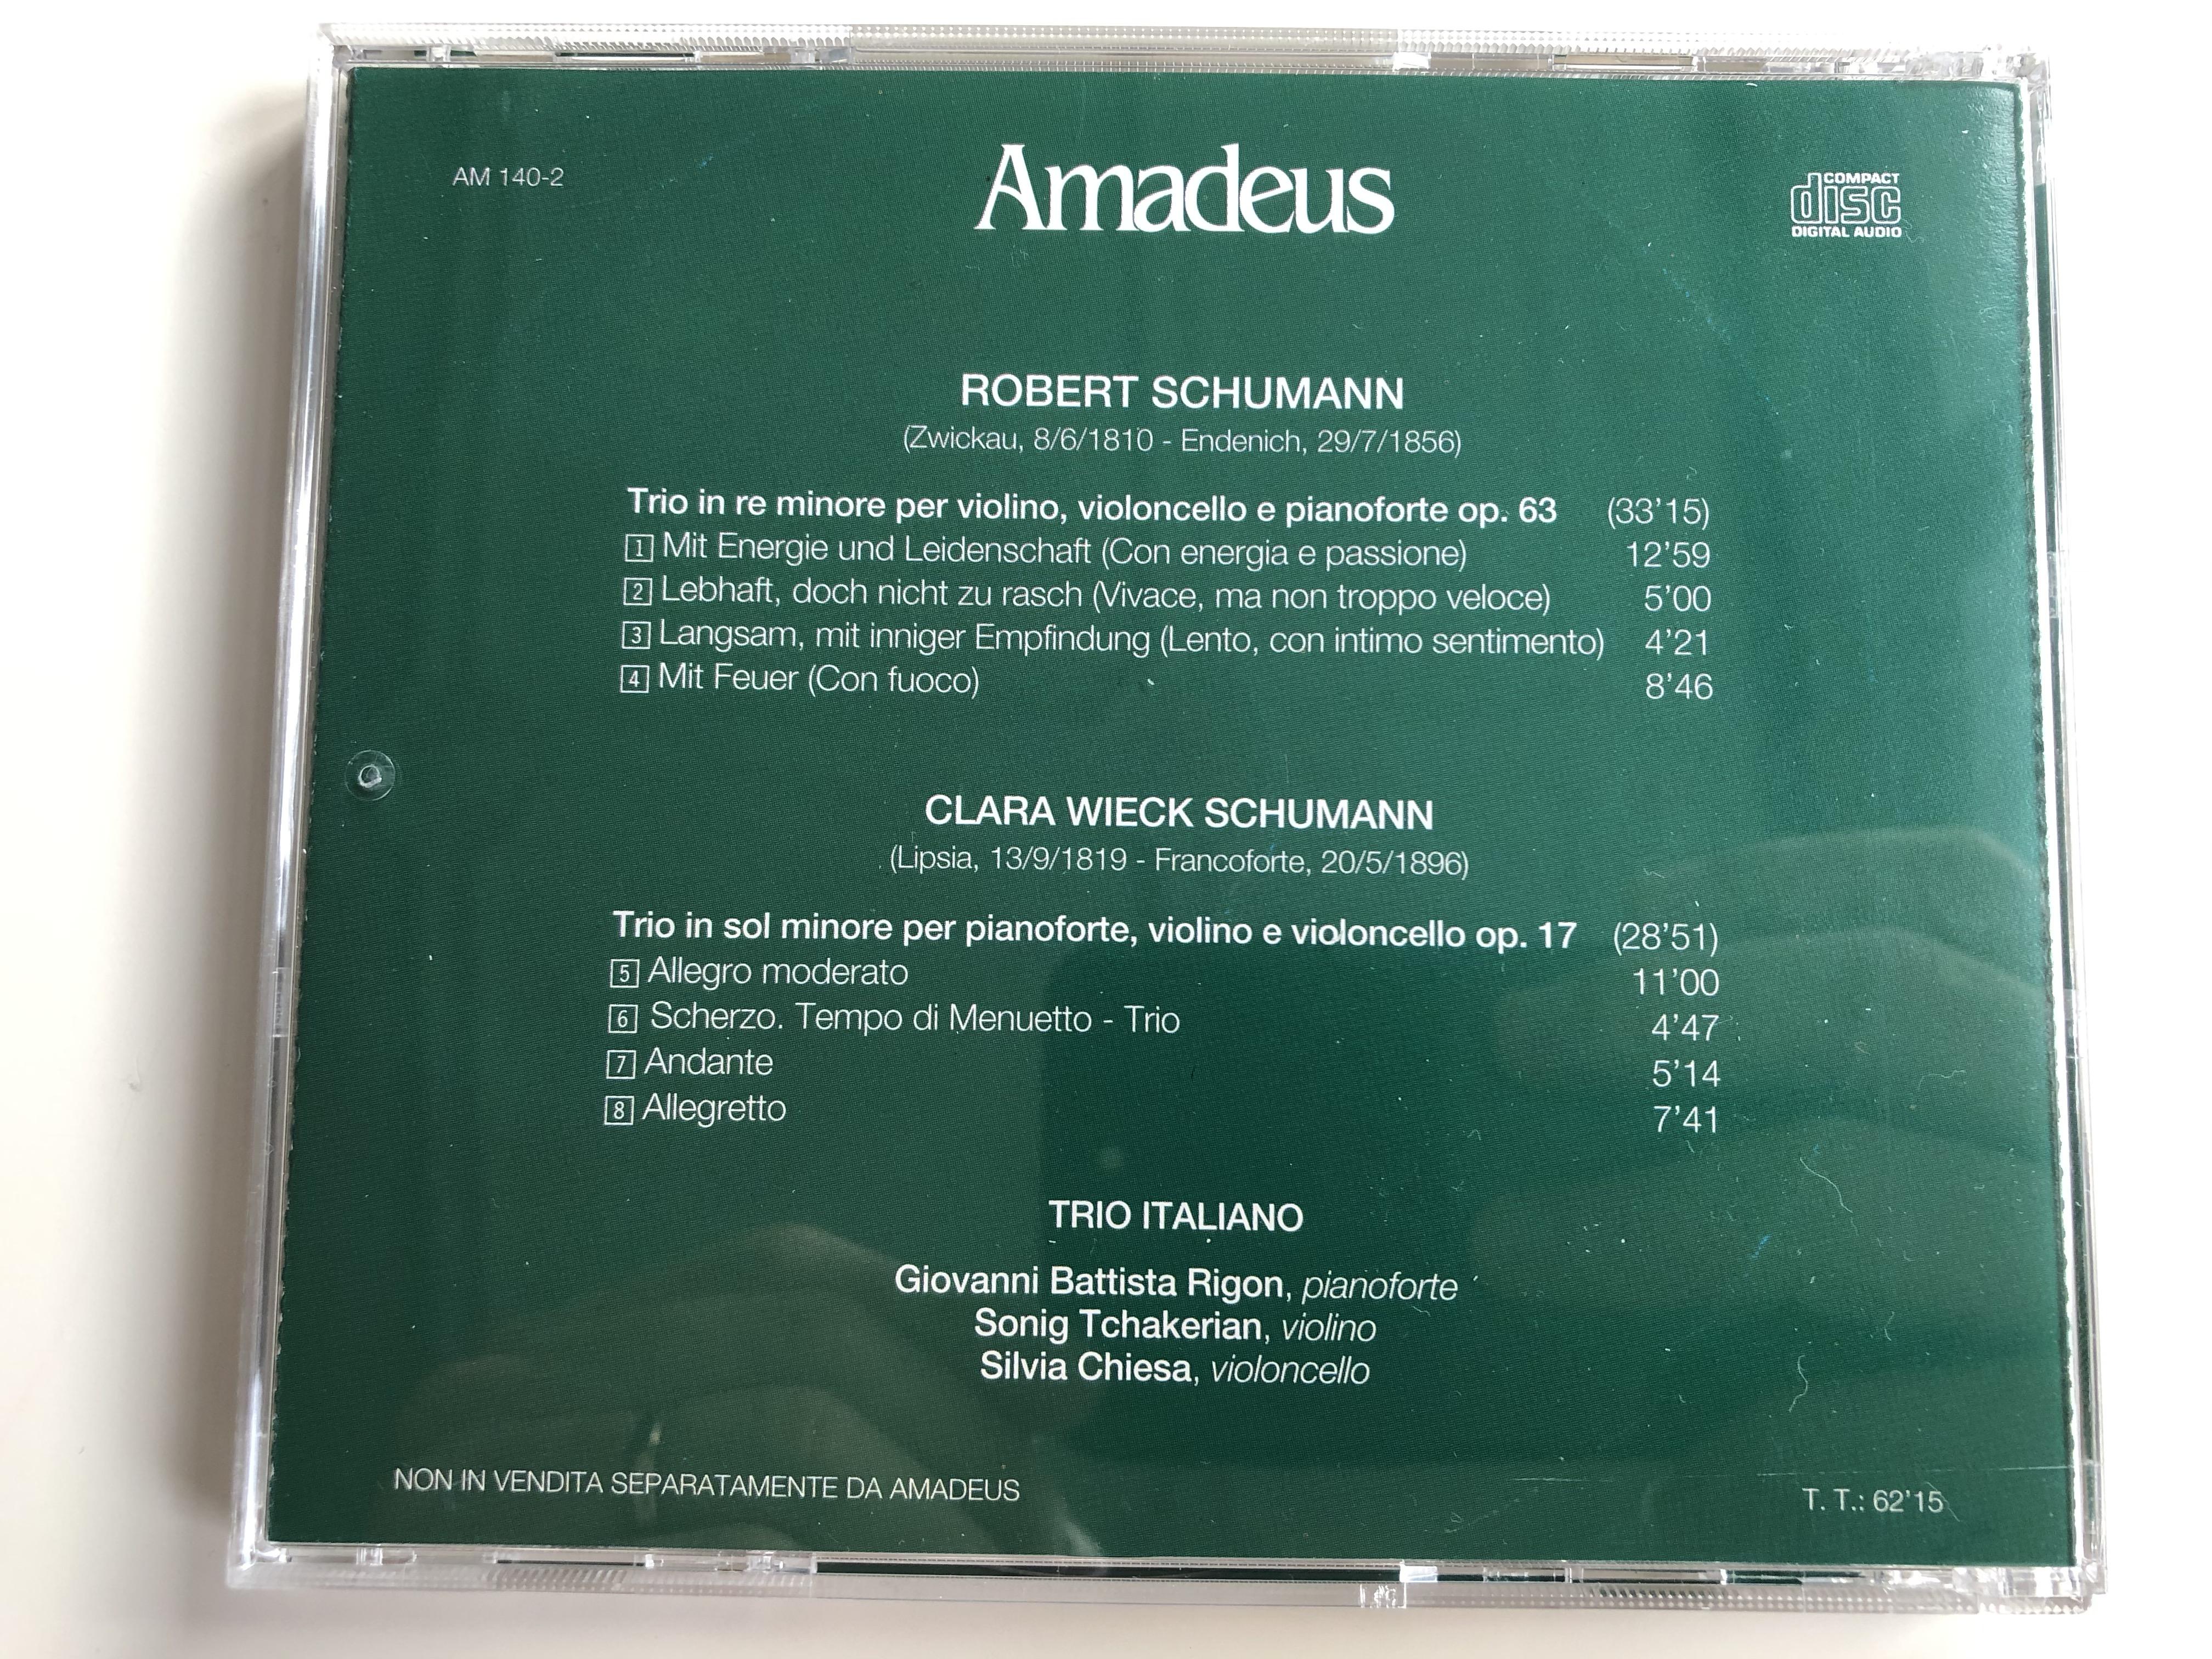 trii-per-pianoforte-e-archi-trio-italiano-robert-e-clara-schumann-amadeus-audio-cd-2001-am-140-2-10-.jpg